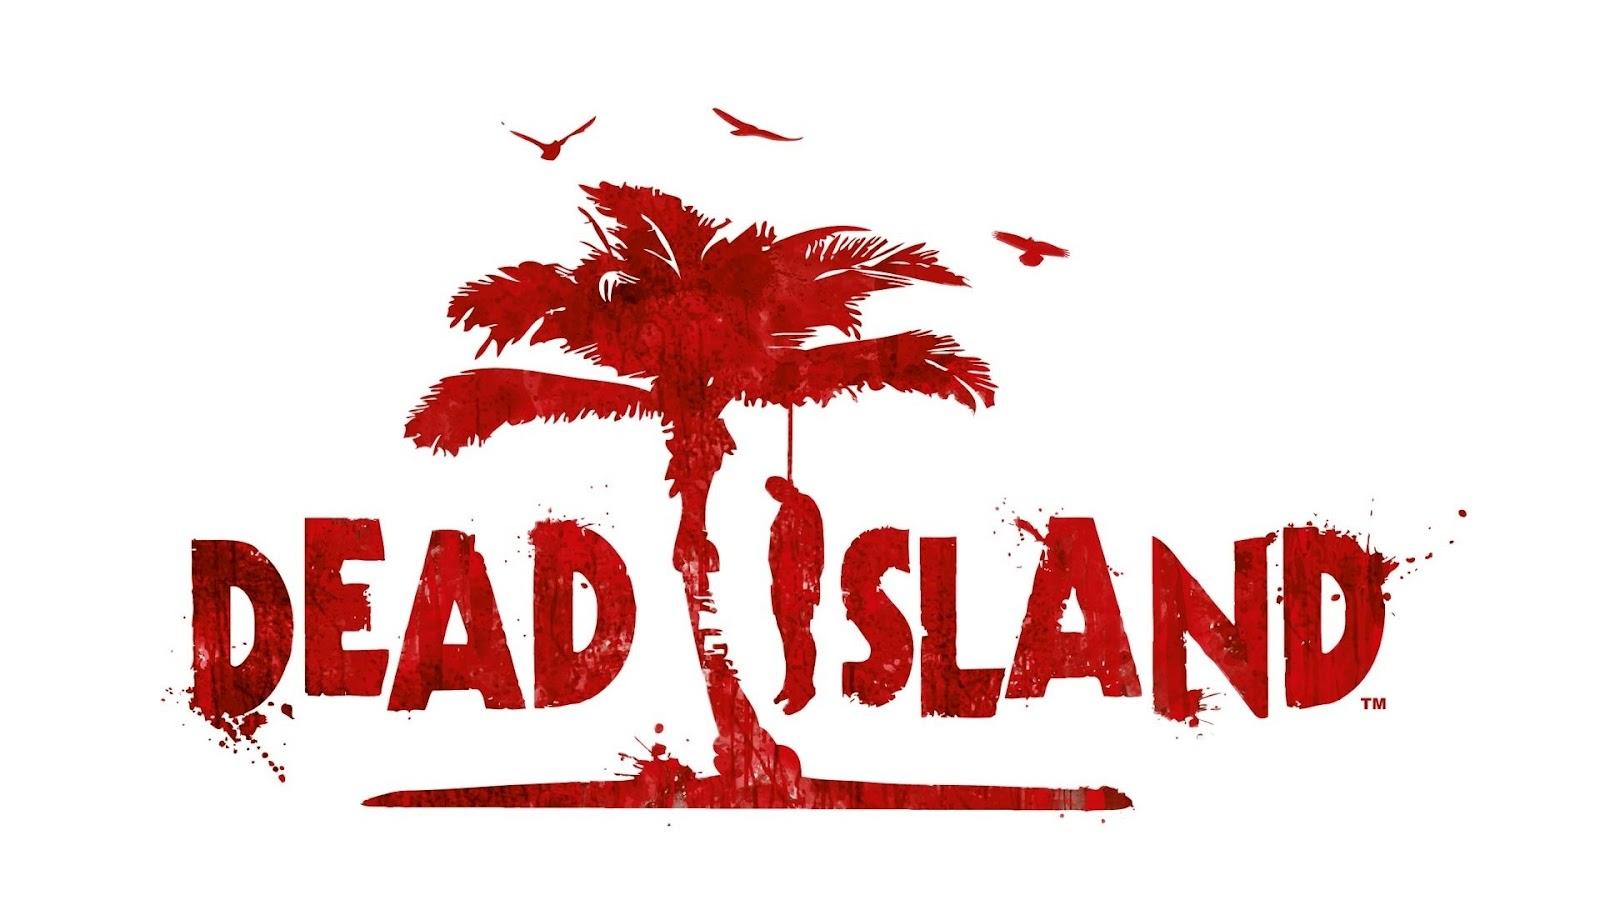 http://4.bp.blogspot.com/-sLnnP2nwDTM/UF67ZpJEBWI/AAAAAAAAA_o/Z4u2uq_l6c4/s1600/scary+wallpaper+-+dead+island+wallpaper+1.jpg